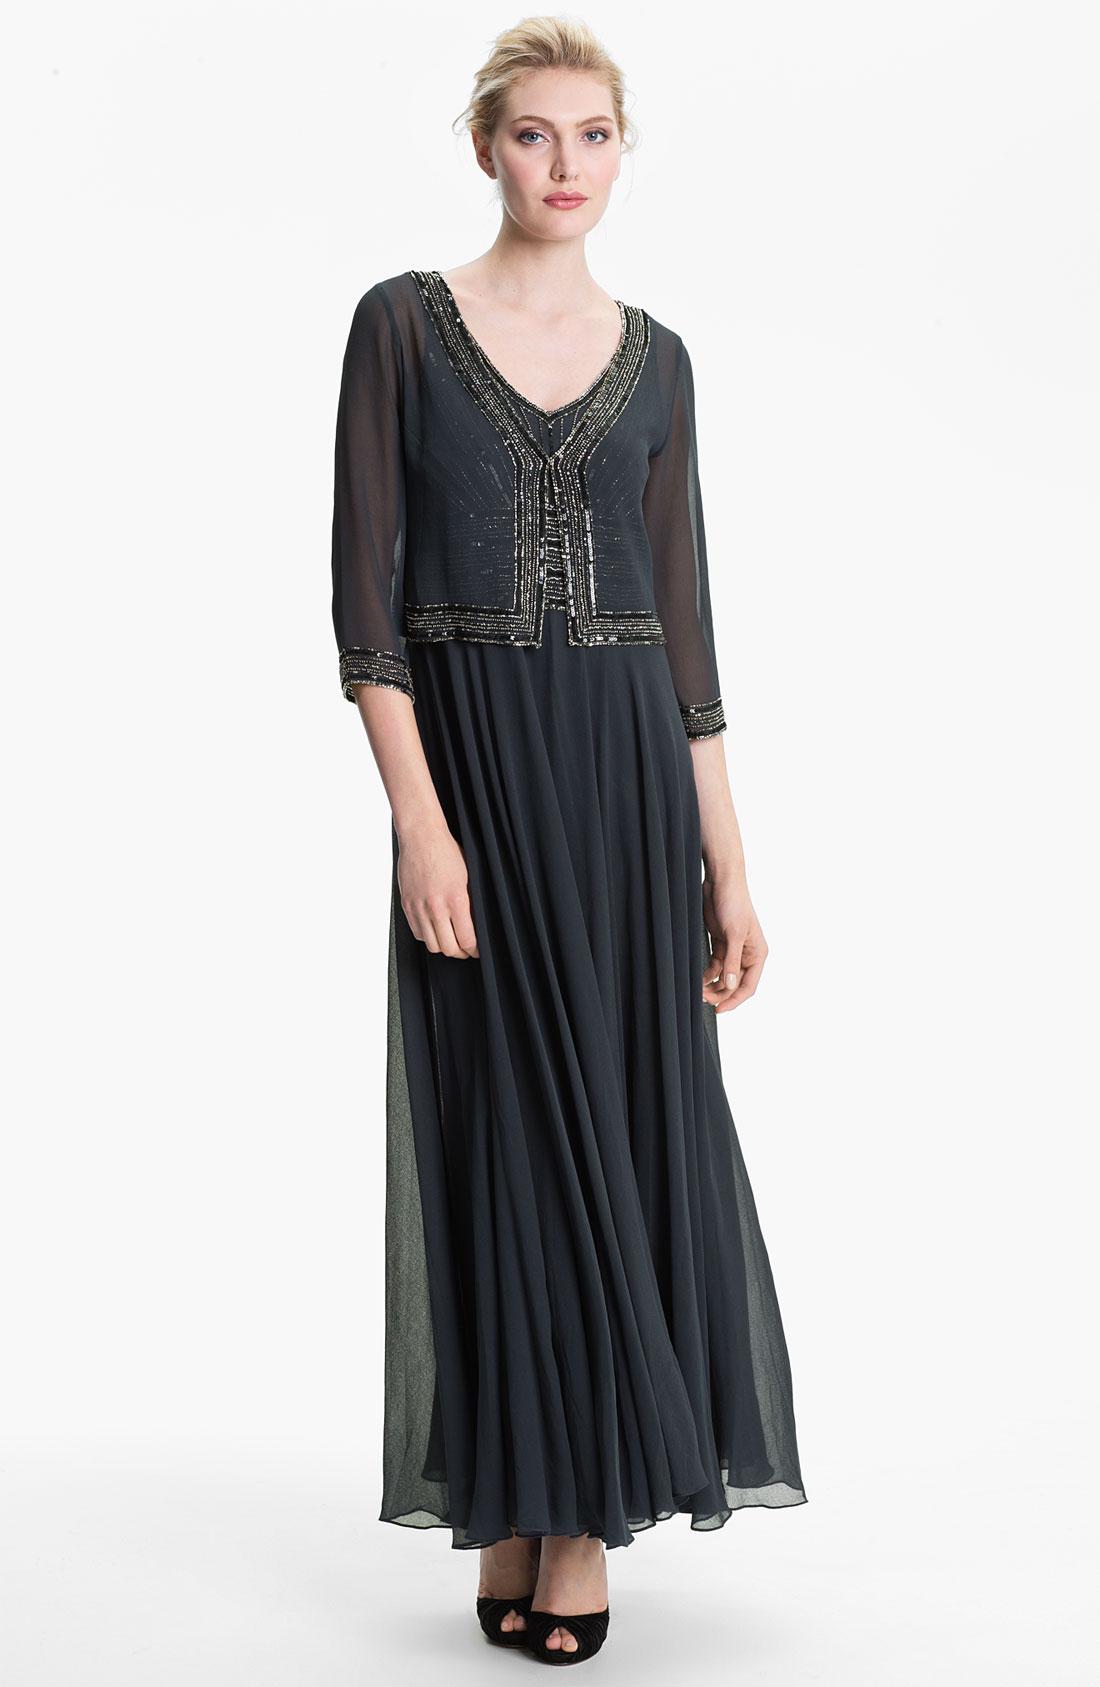 J Kara Plus Size Evening Dresses Cocktail Dresses 2016